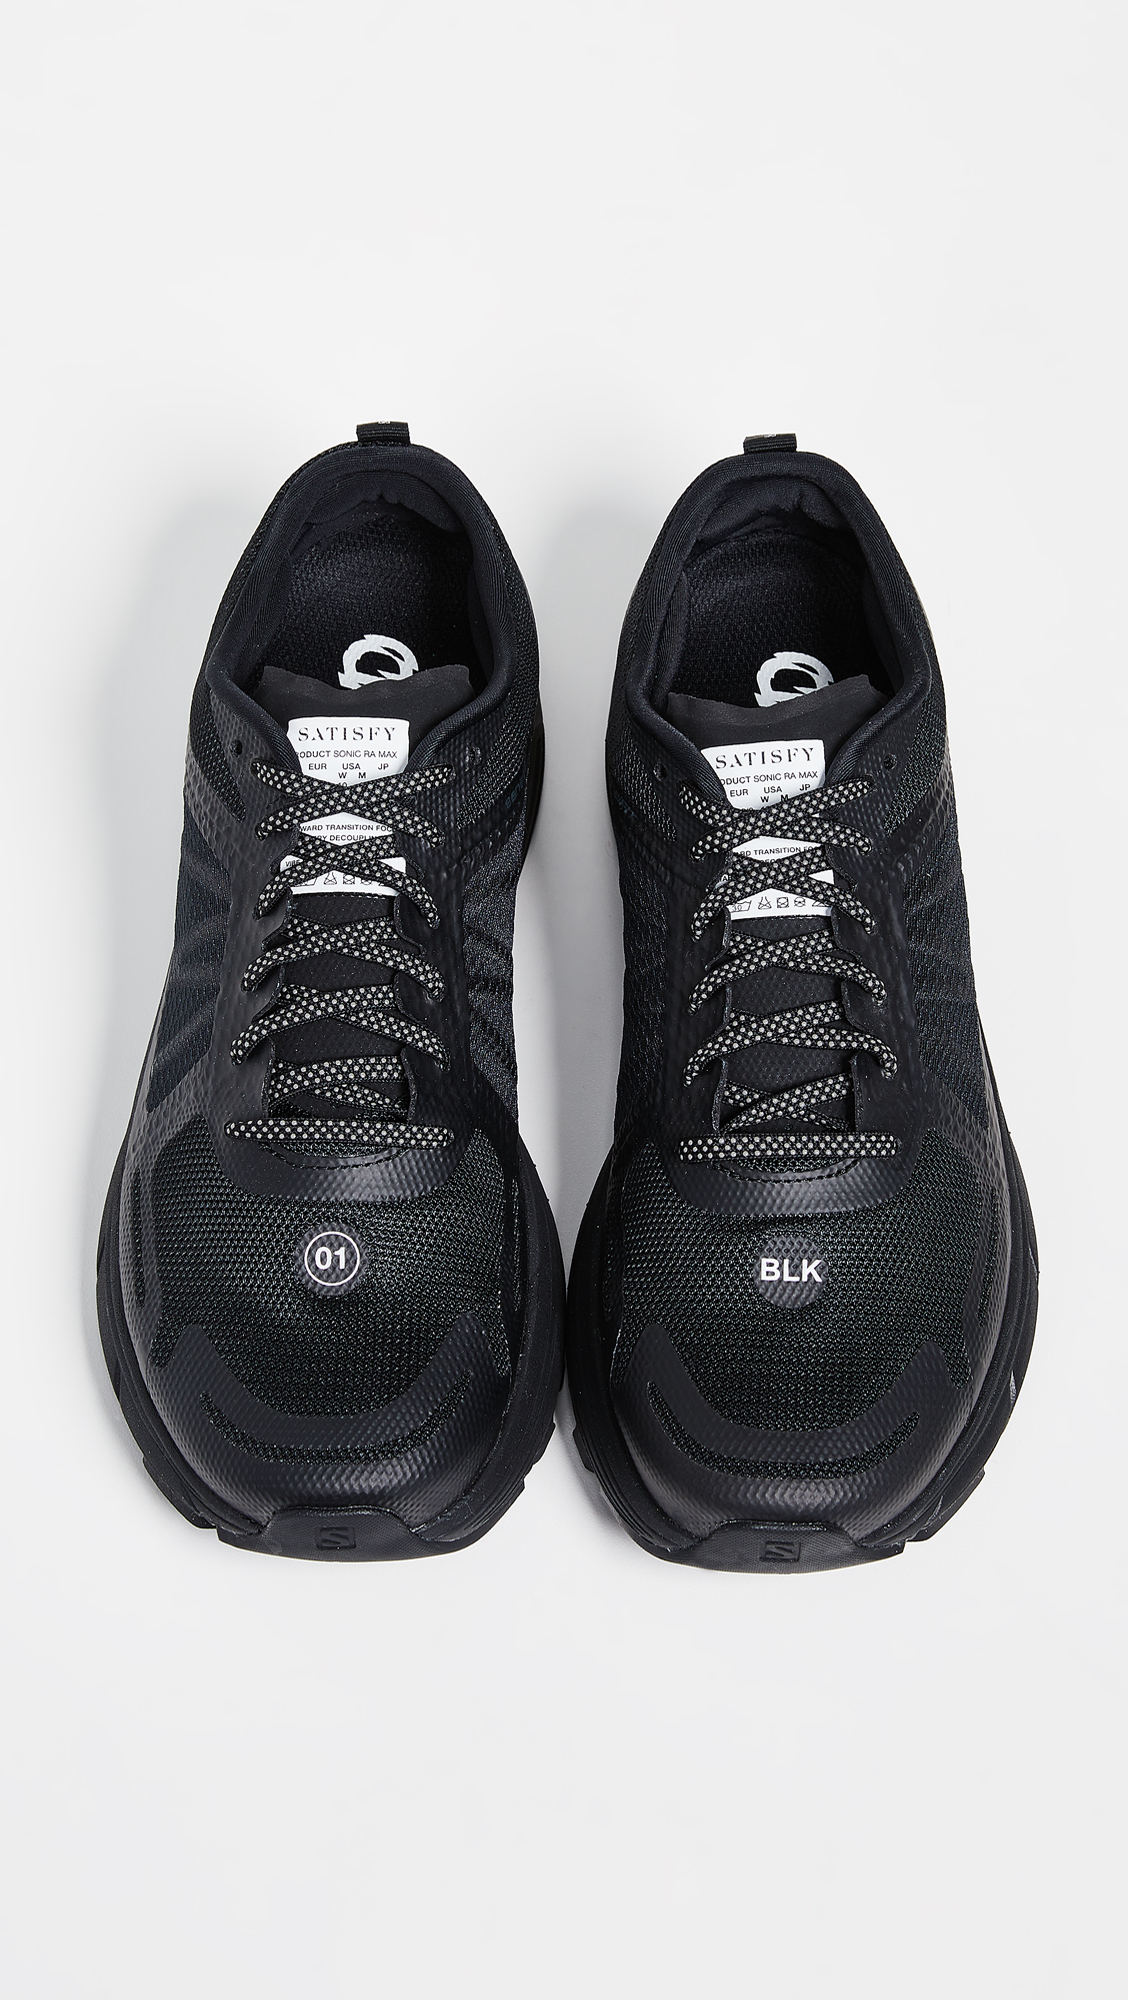 600cbf79b2ea5 Satisfy x Salomon Sonic RA Sneakers